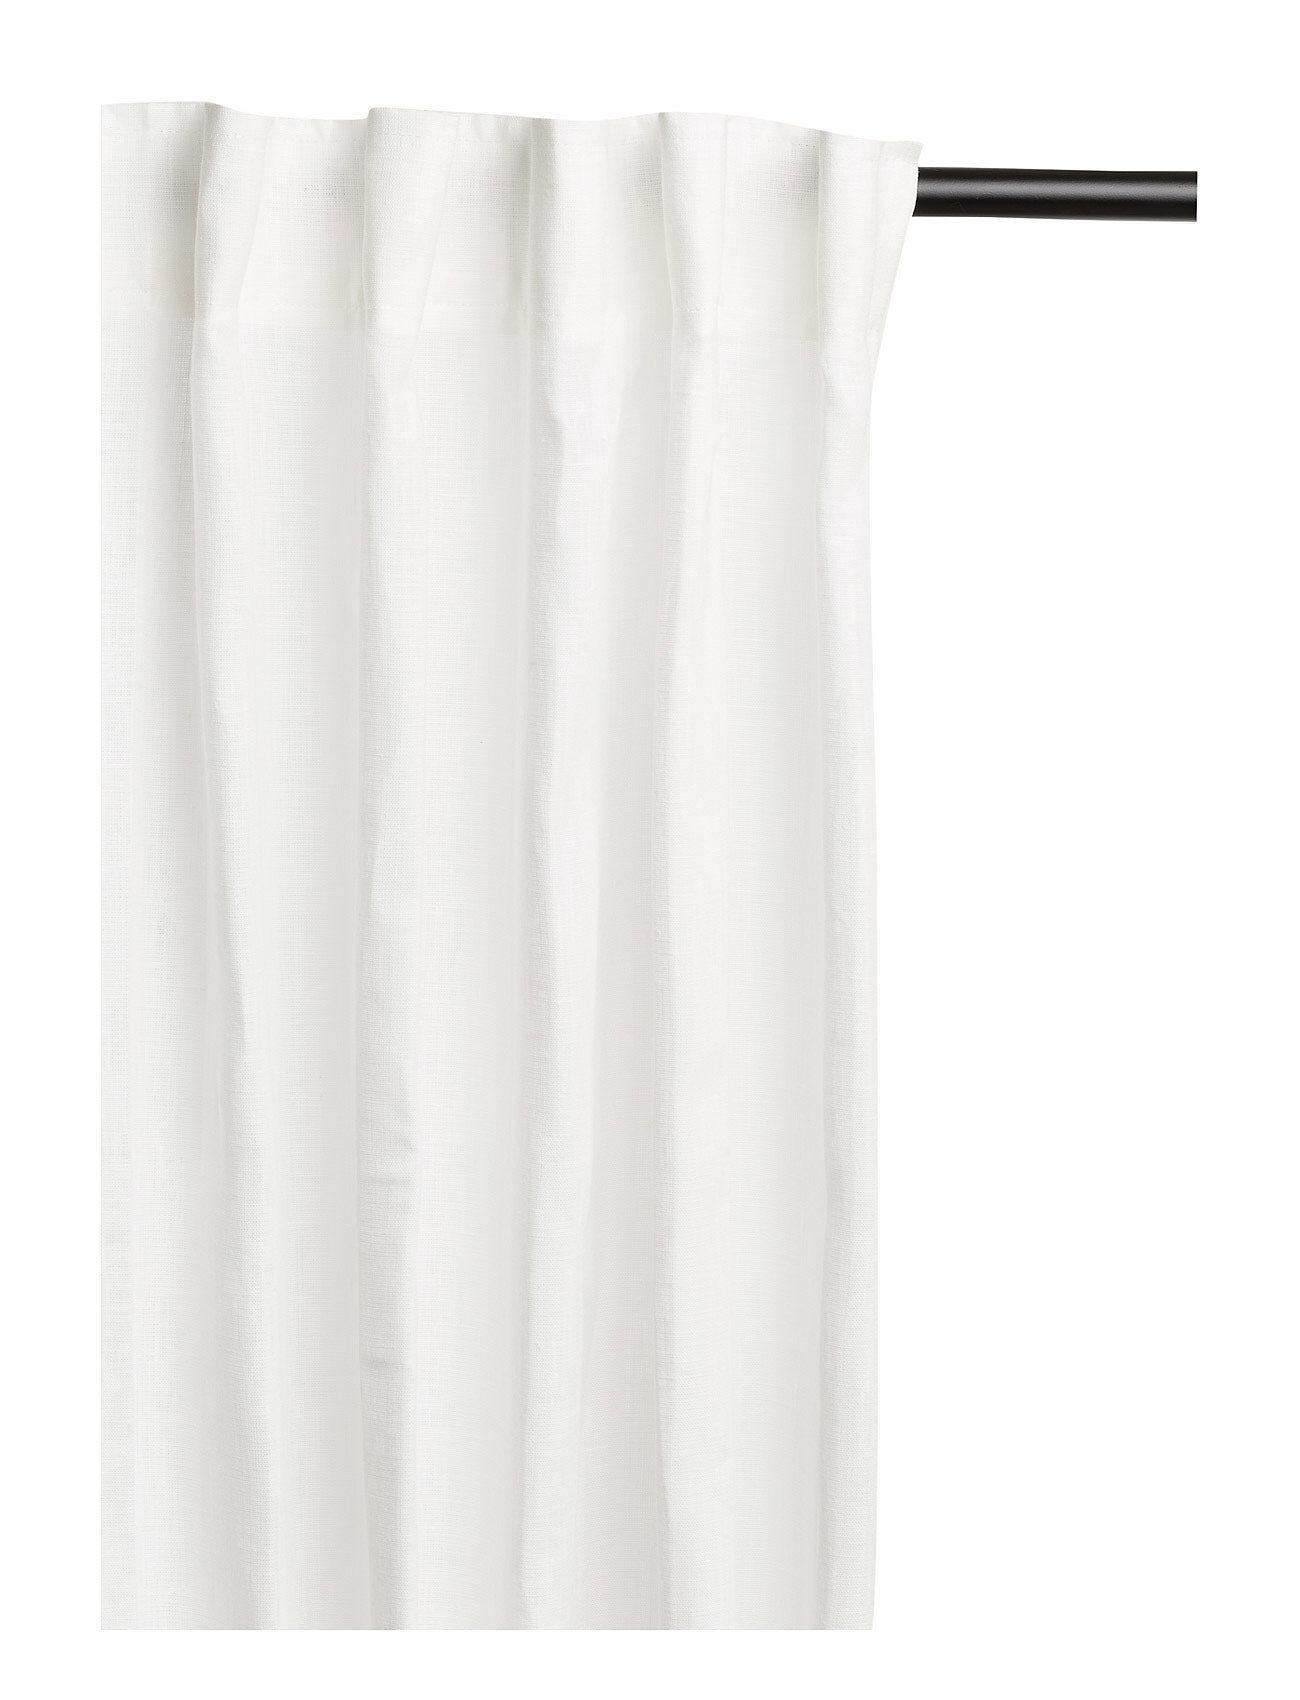 Himla Lilja Curtain With Headingtape Home Living Room Curtains Valkoinen Himla